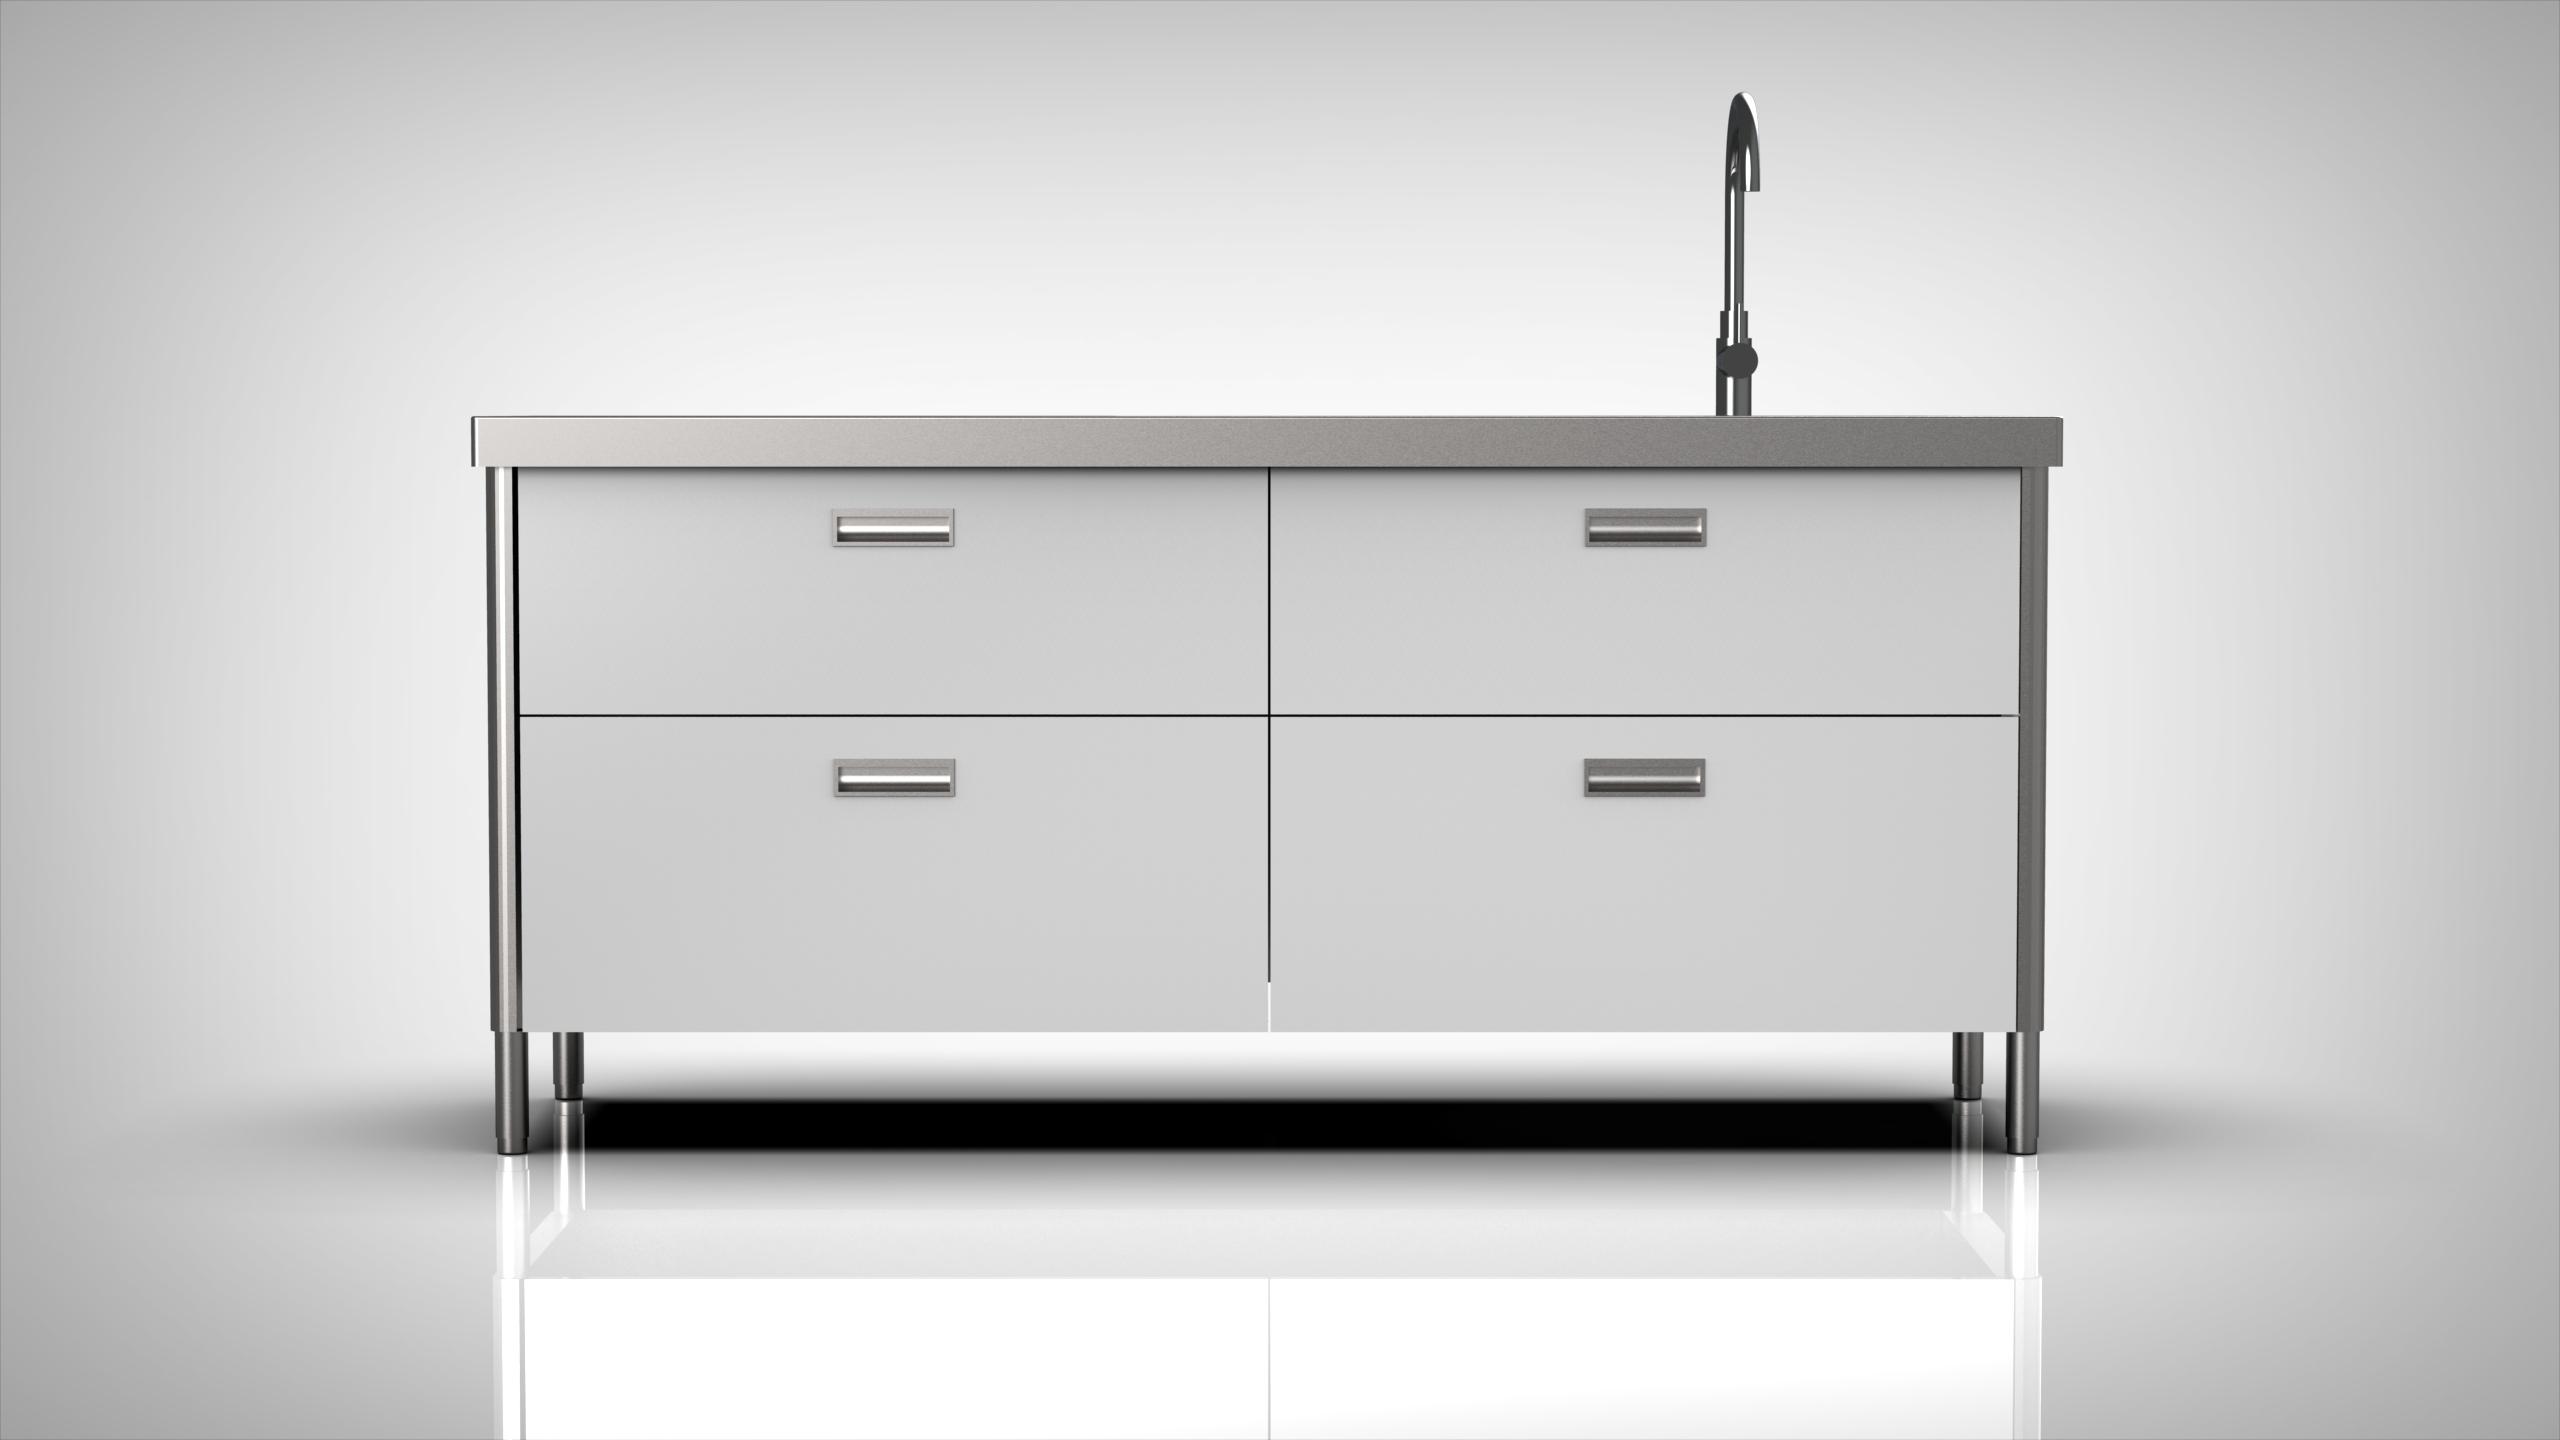 Arca Cucine Italy - Levanto - Modulo 190 - drawers - Sink 190 - White